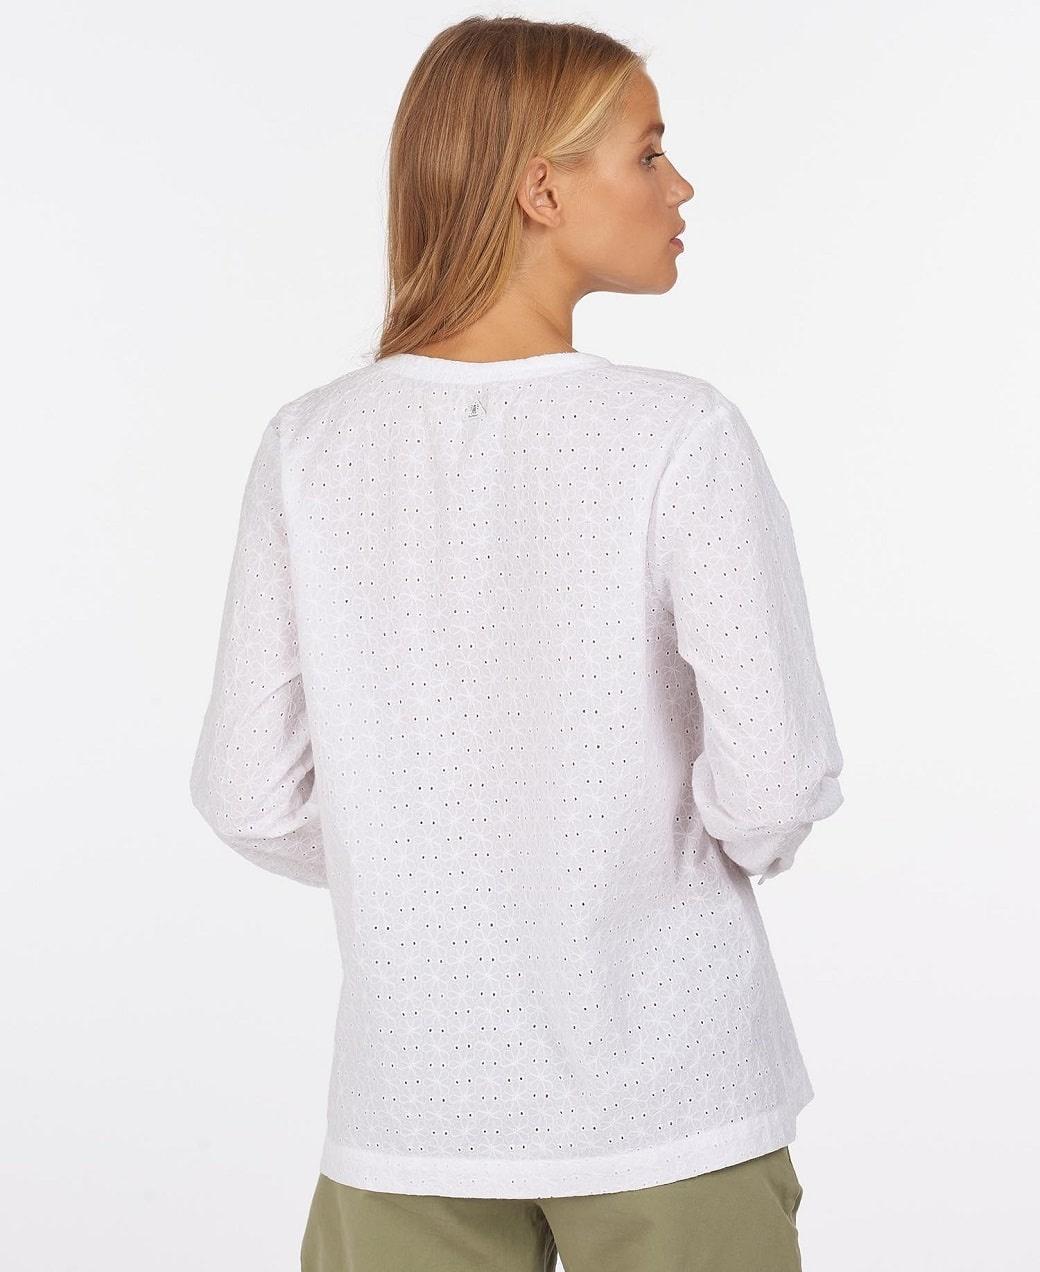 Barbour Folkestone Shirt White-4